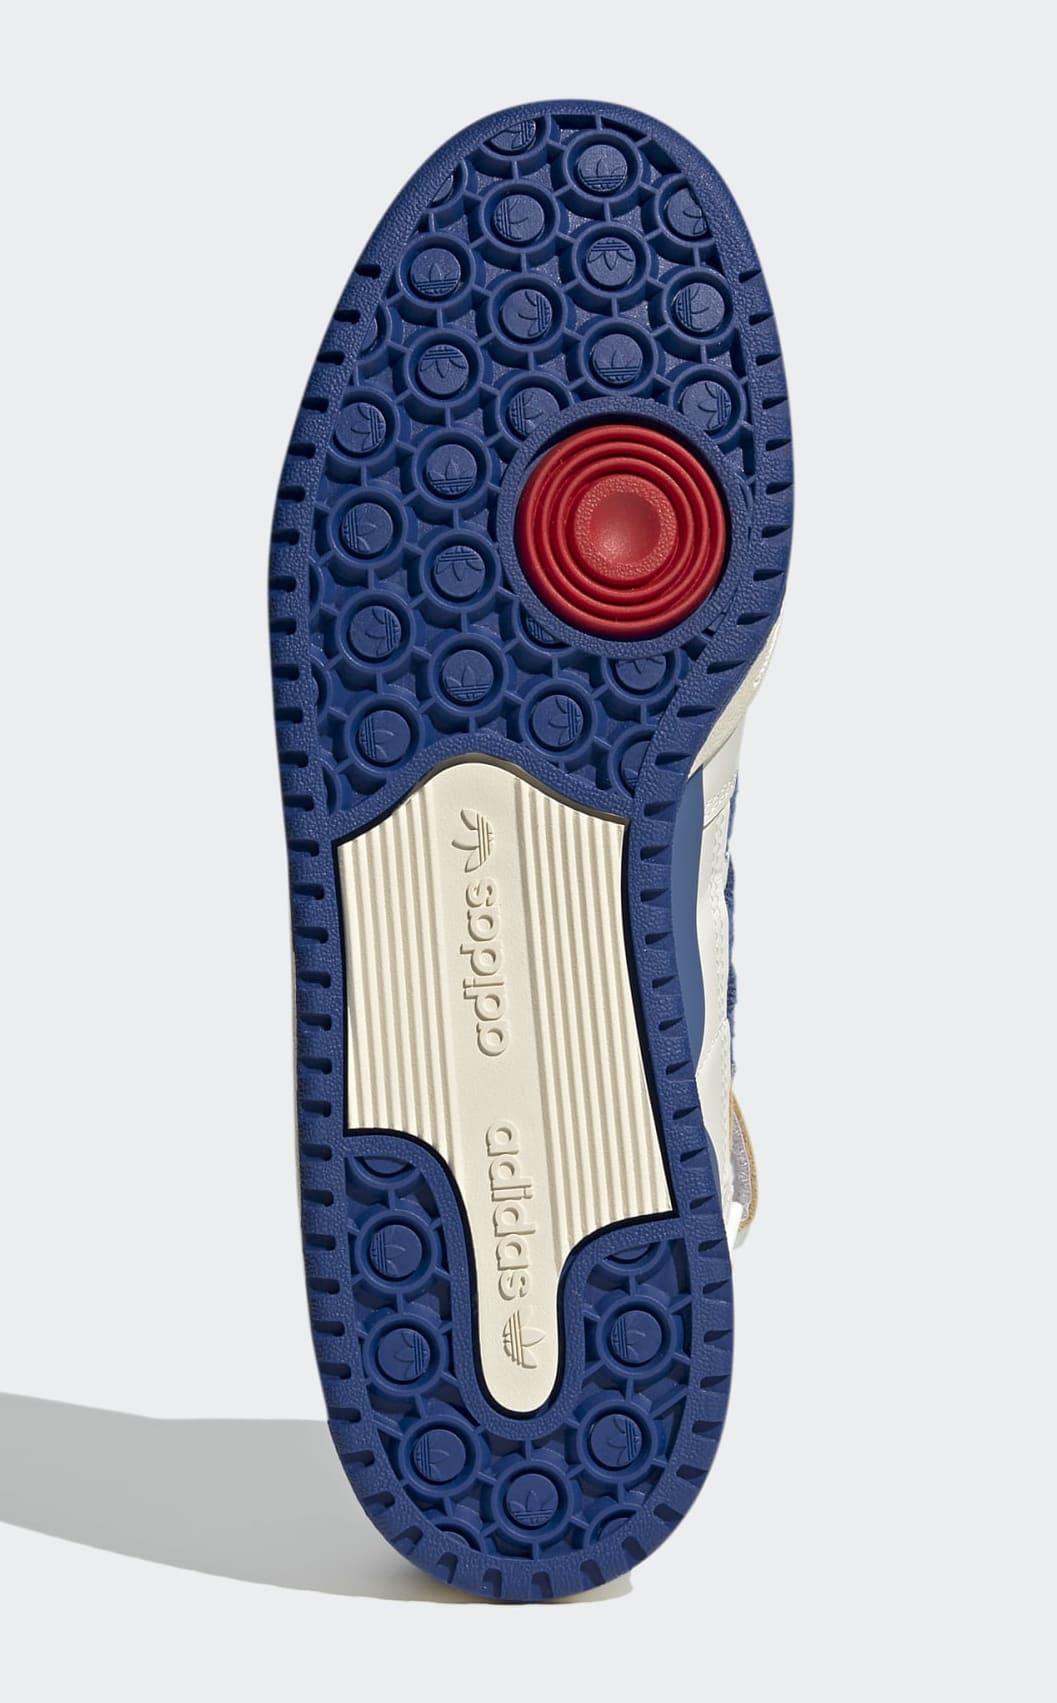 Adidas OG Forum 84 FY7793 Outsole